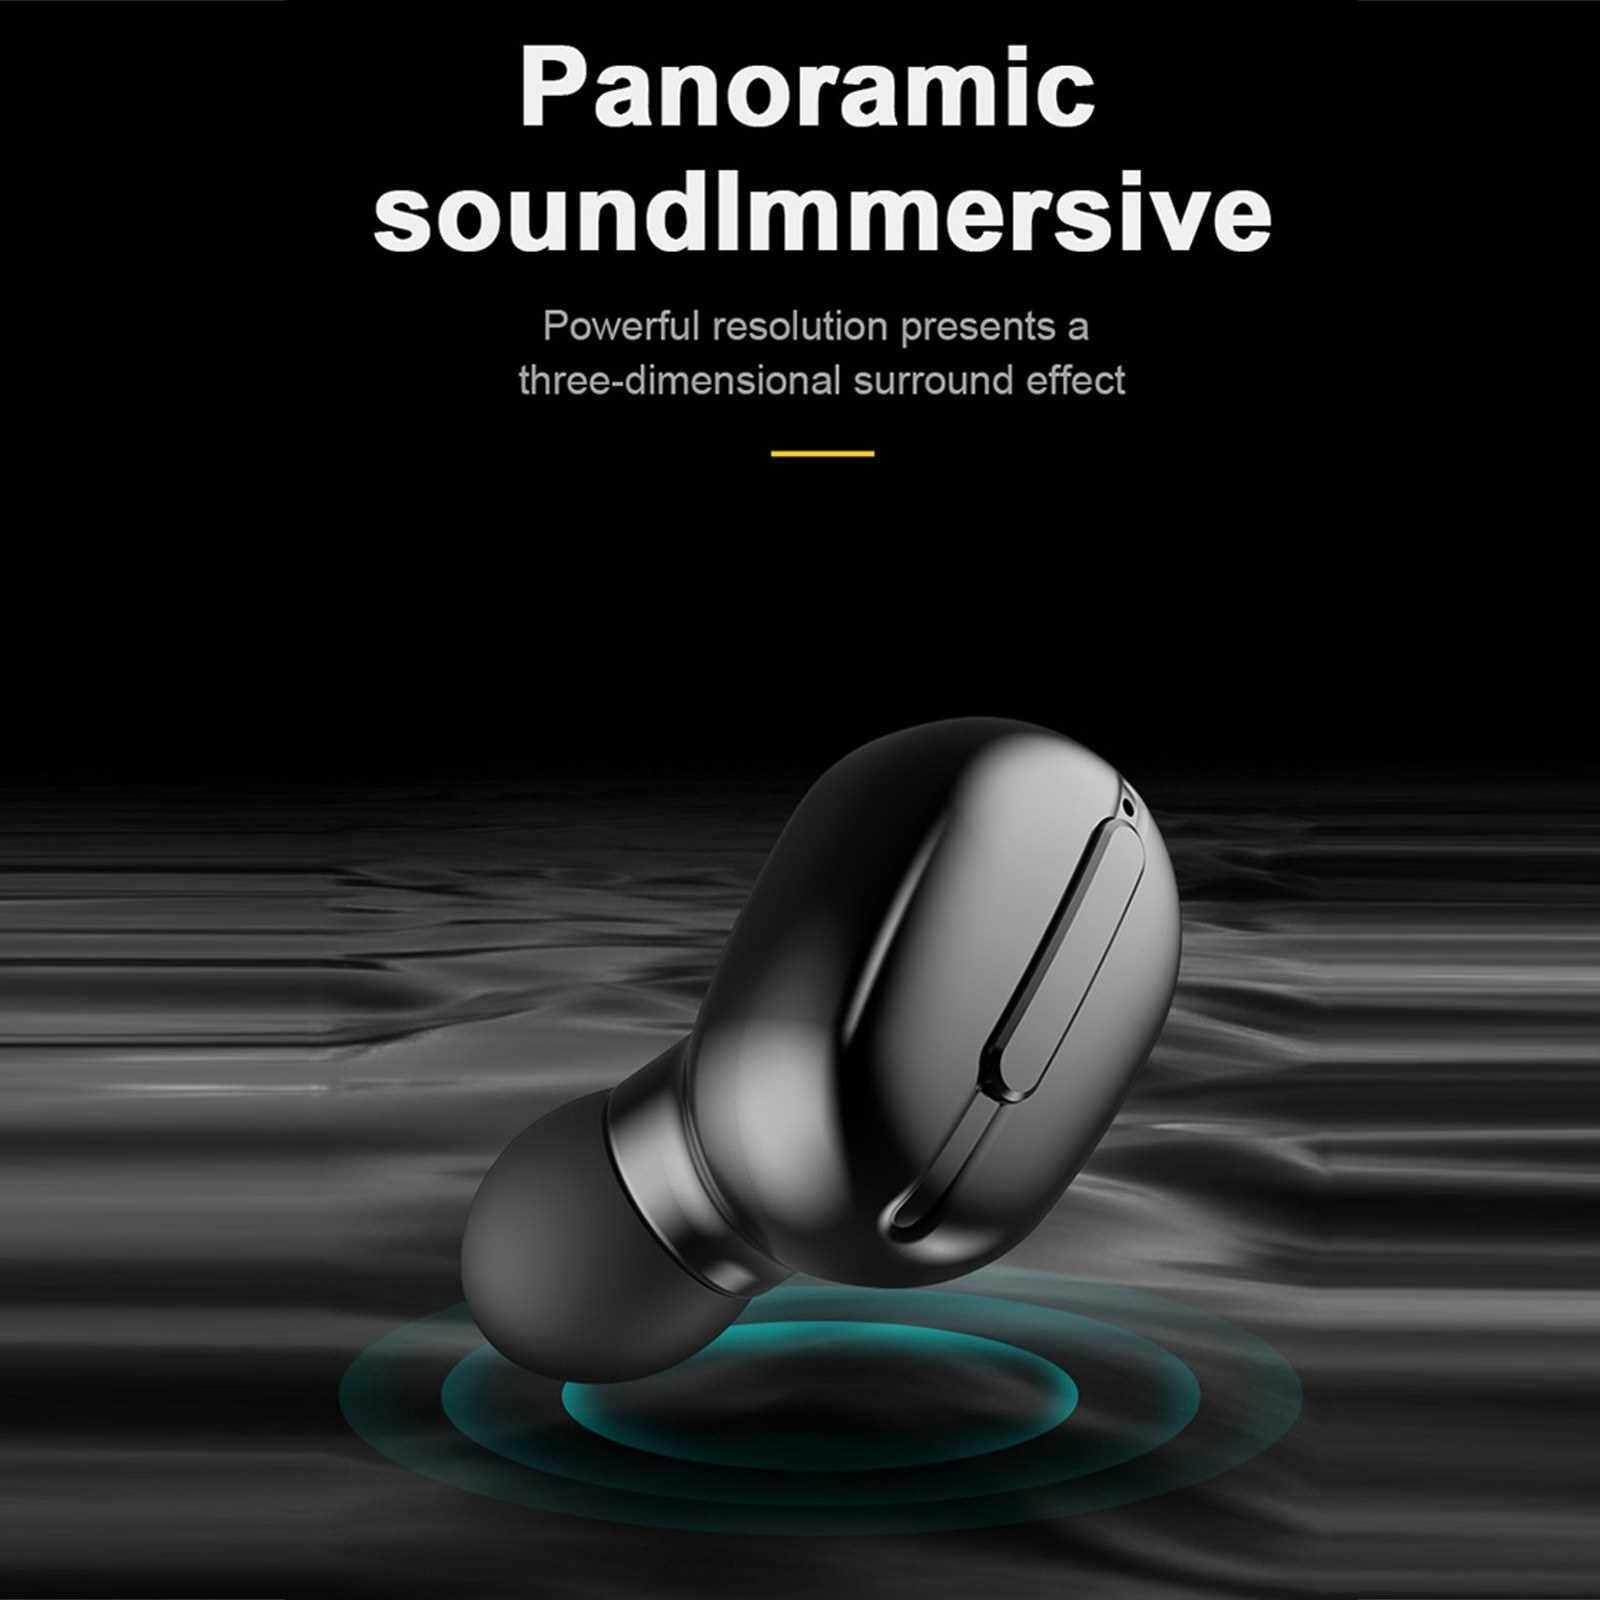 Best Selling L13 Mini TWS Bluetooth 5.0 Earphones Wireless Headphones Sports Waterproof Headsets Earbuds with Microphone Charging Box (Black)